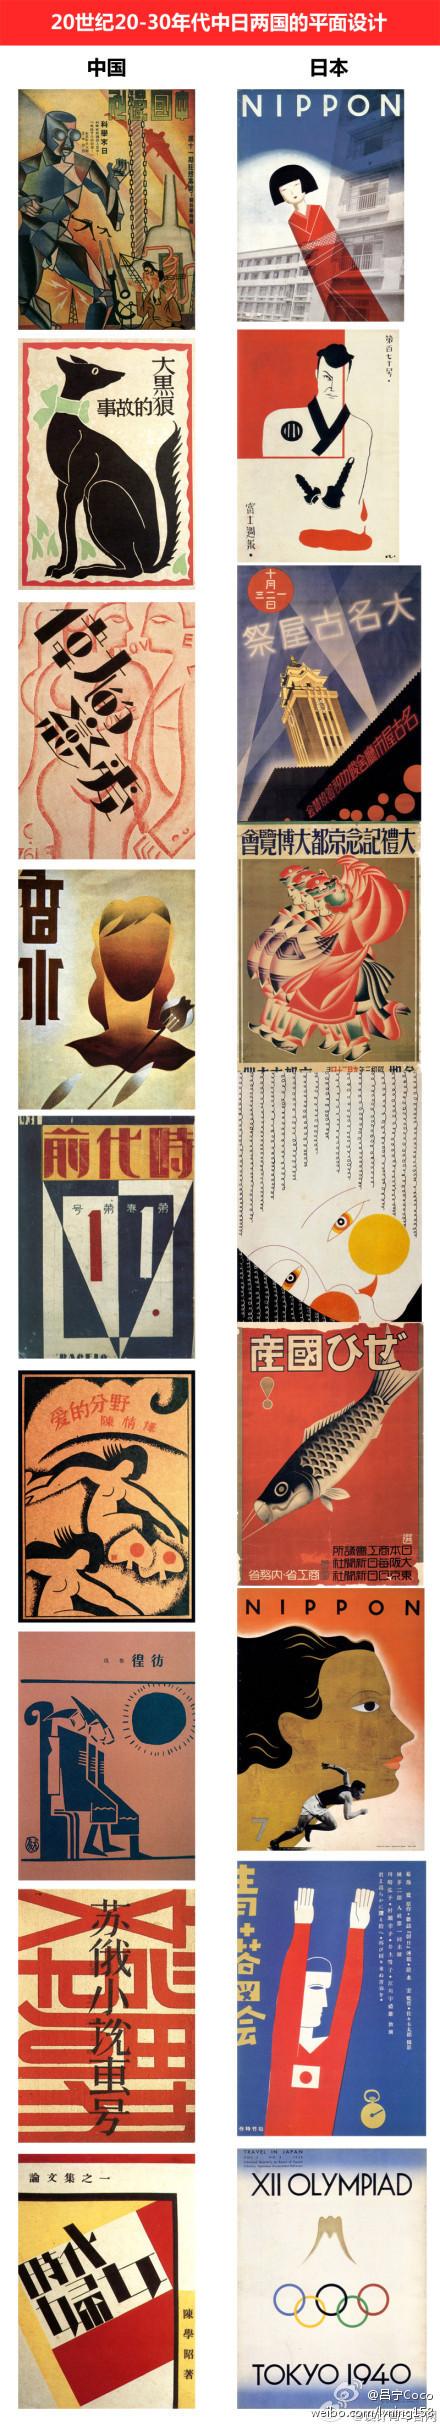 MORE_墨的微博   20世纪20-30年代中日海报对比